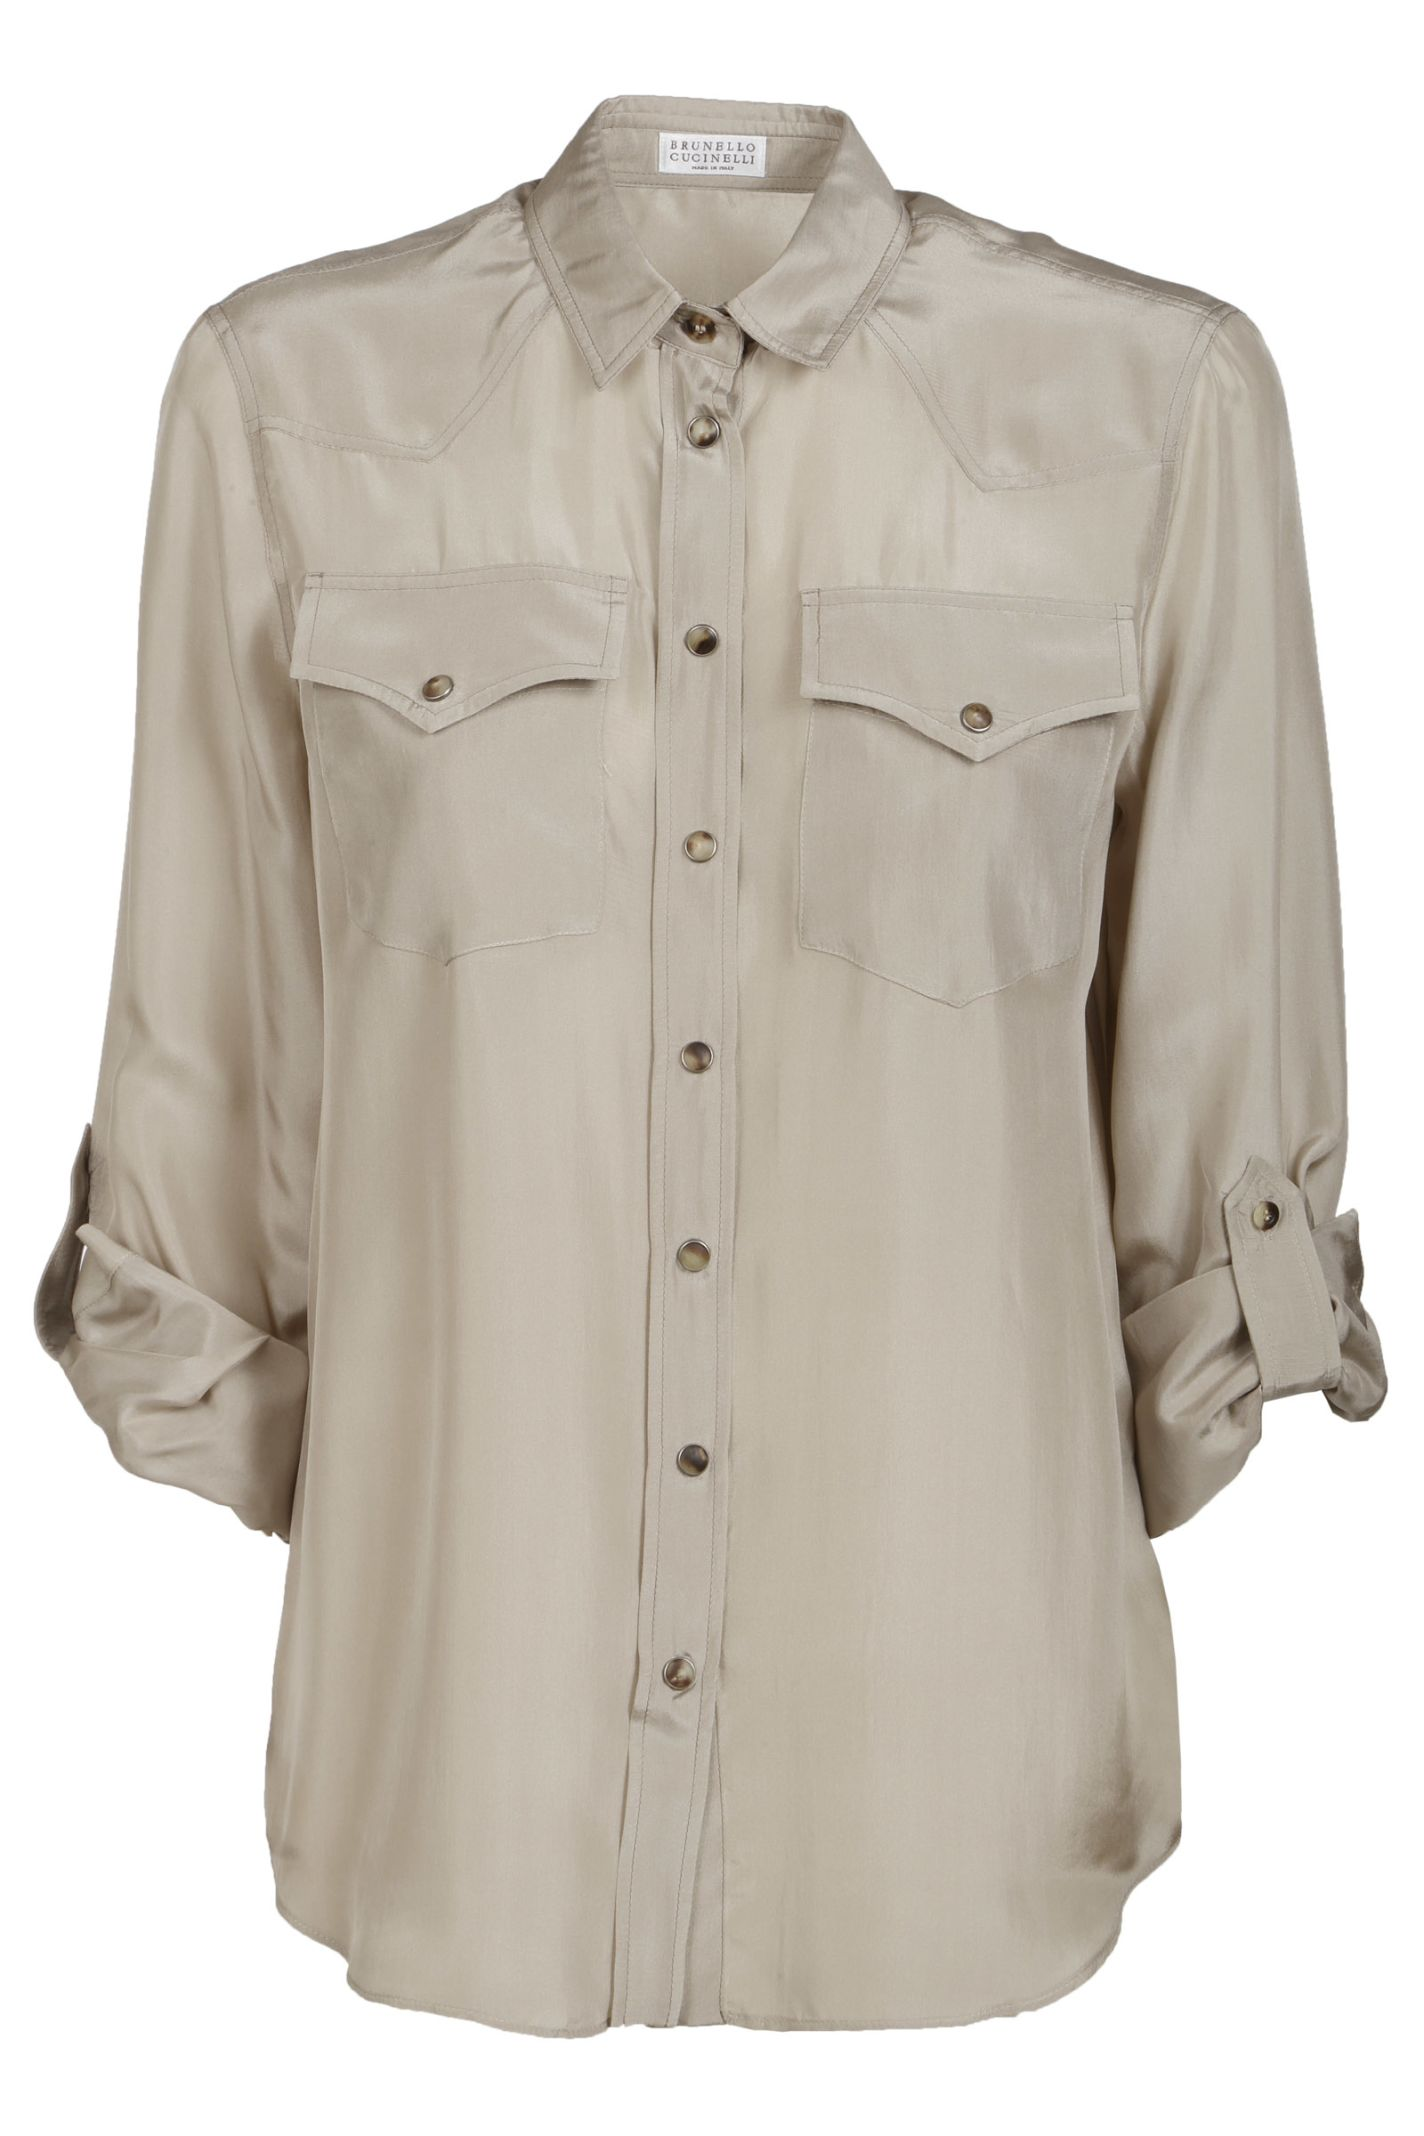 946a531fcd0d0d Brunello Cucinelli Brunello Cucinelli Western Shirt - Basic ...